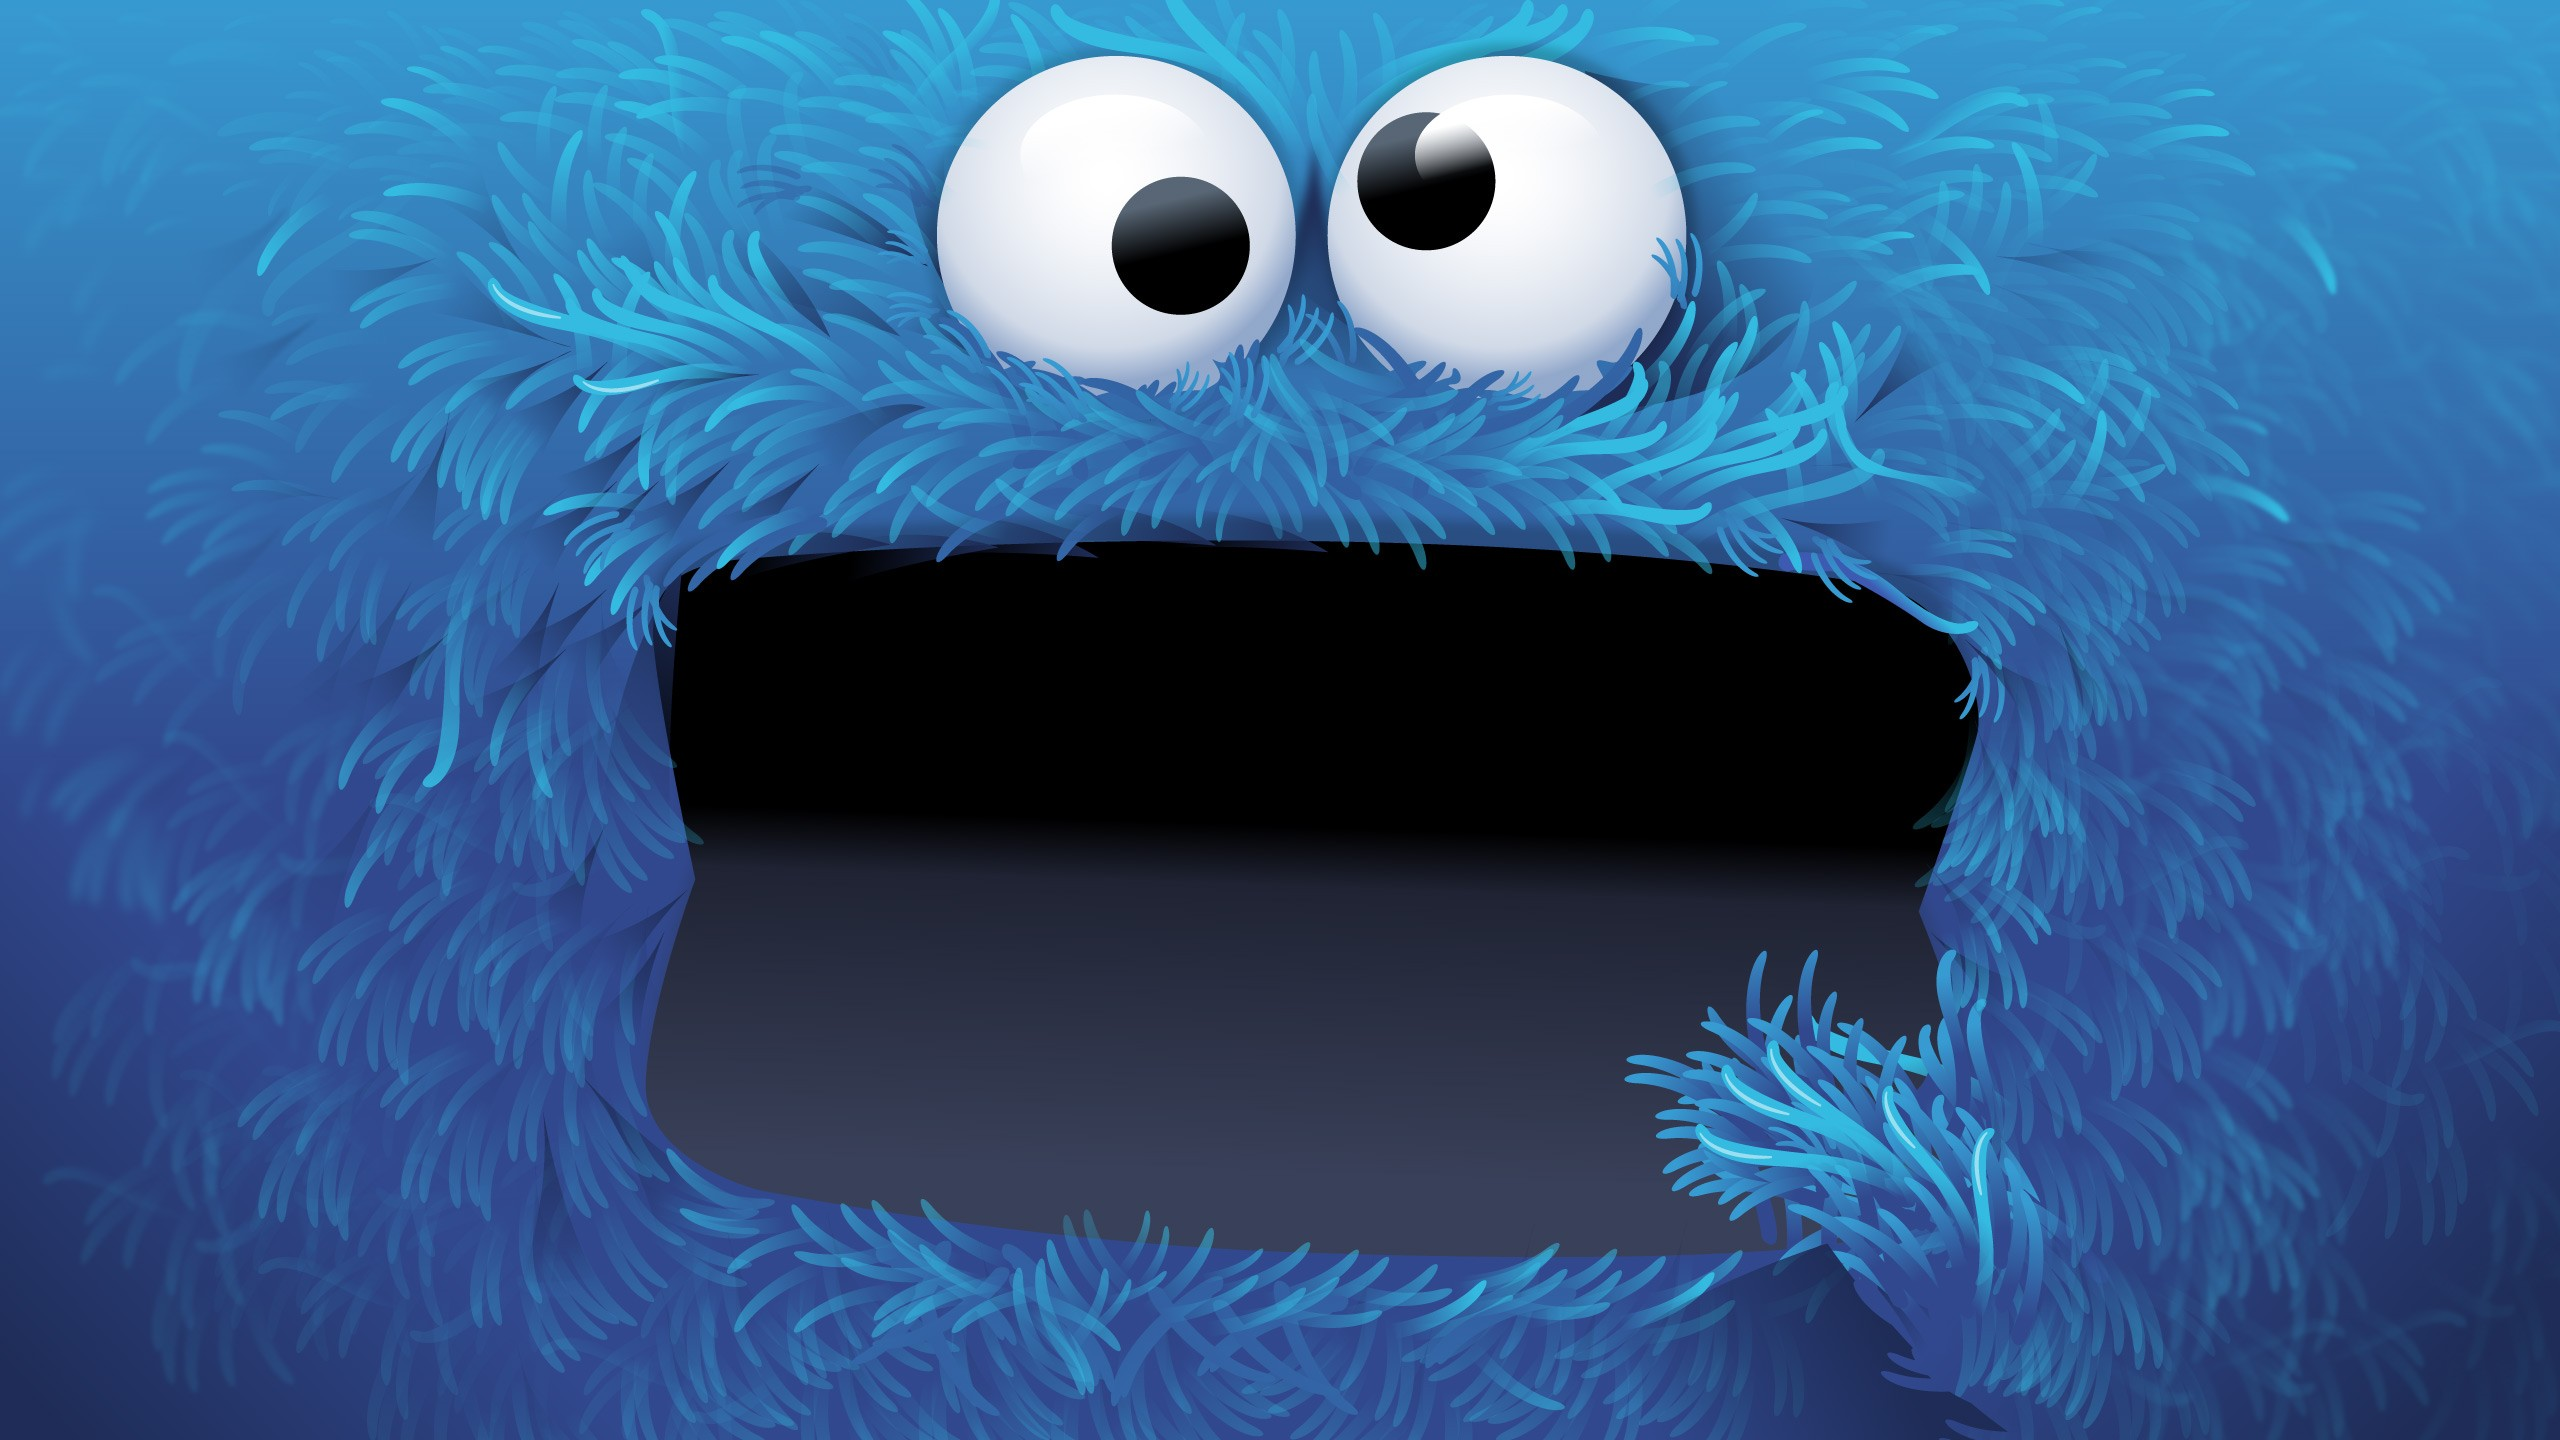 Cute Cookie Monster Wallpaper Hd Funny 3d Cartoon Hd Images Pixelstalk Net